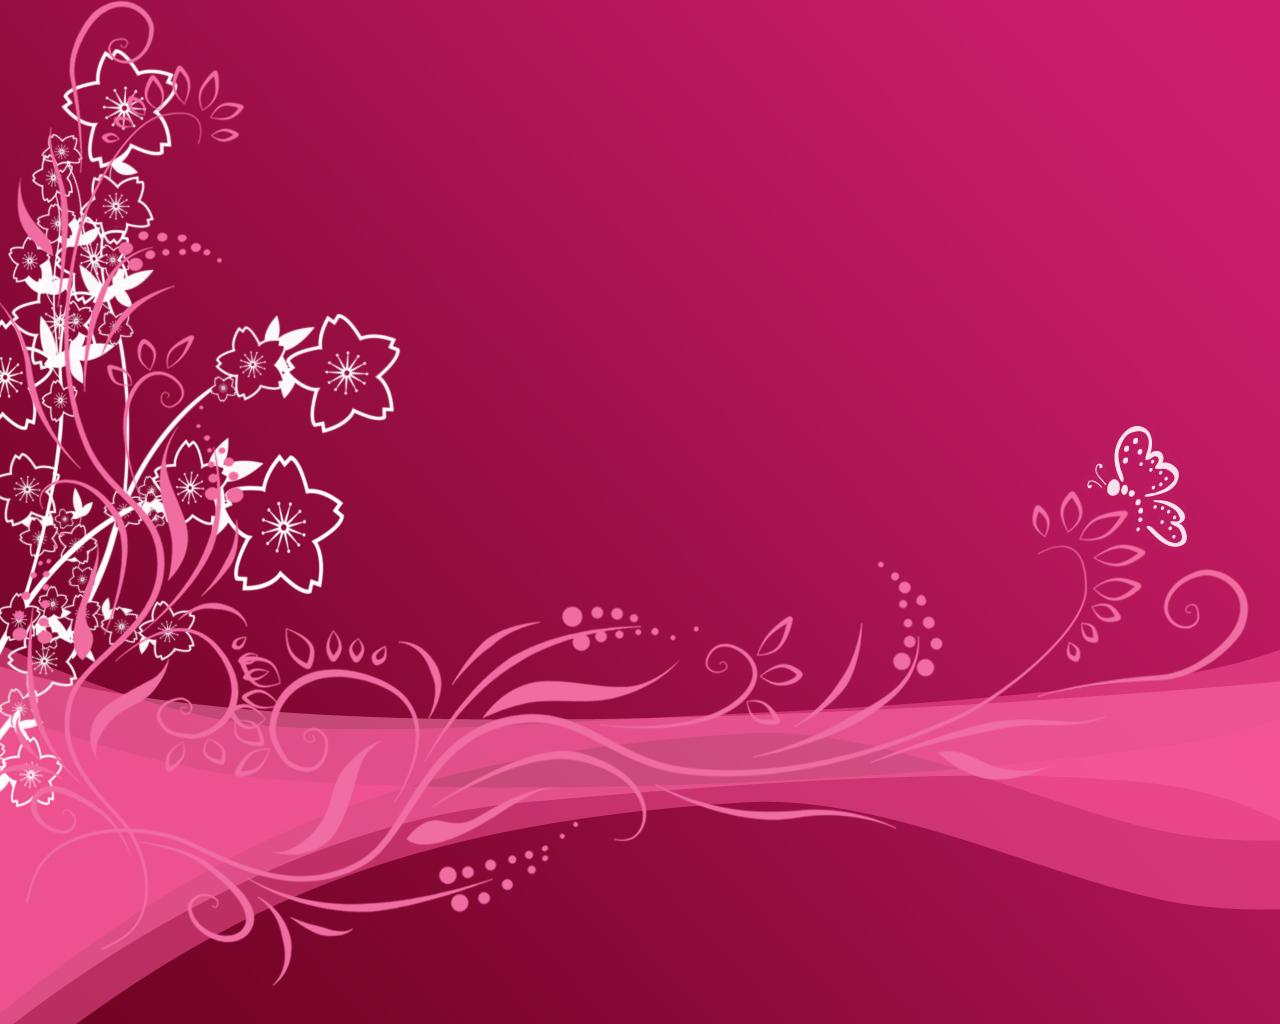 Wallpaper Abstract Pink Hd Desktop Background Wallpaper Gallery 1280x1024